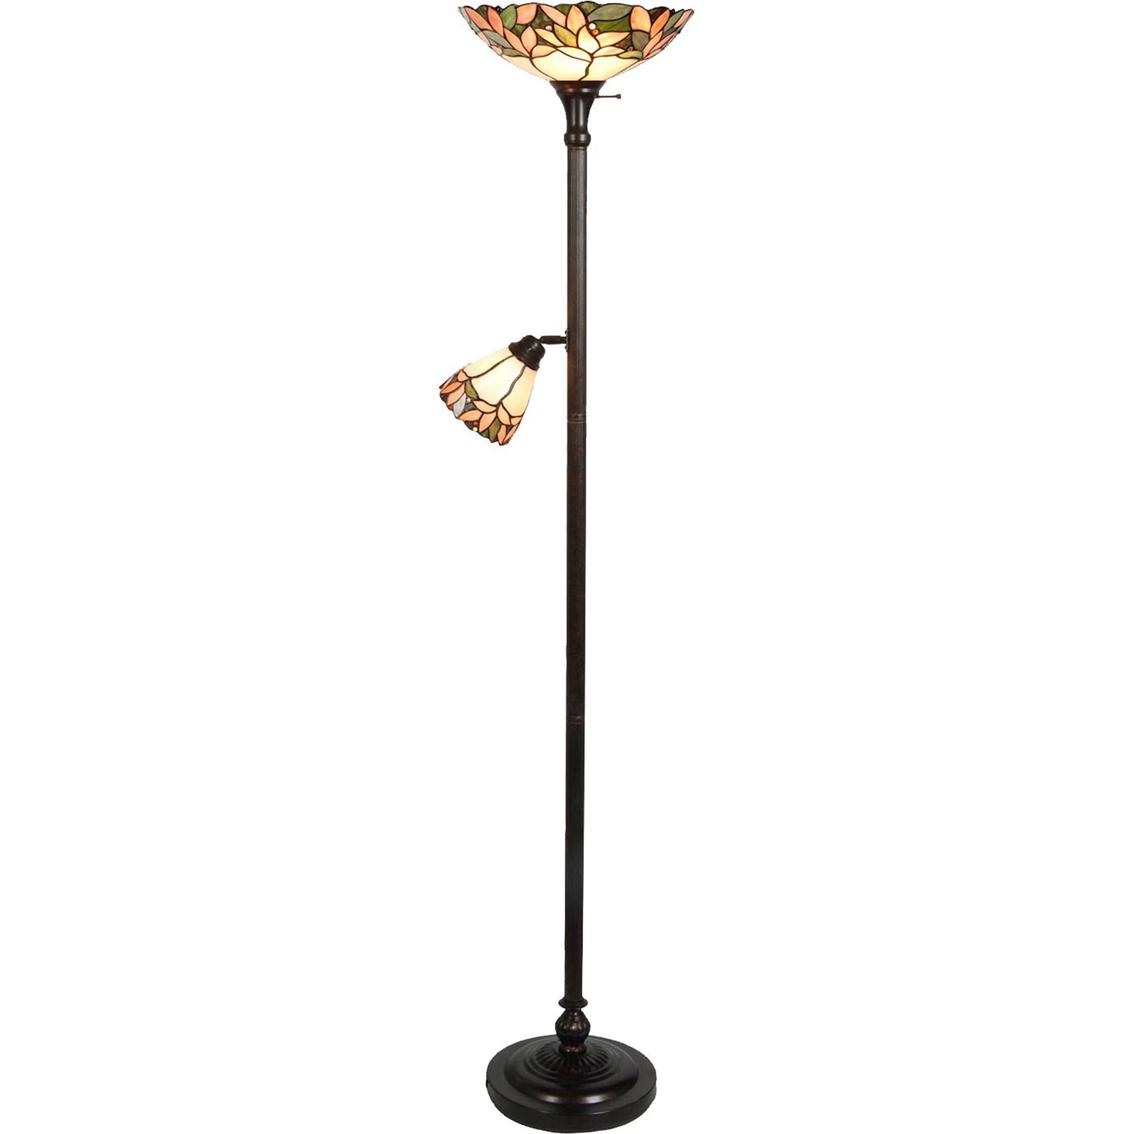 dale tiffany crystal leaf torchiere floor lamp floor With torchiere floor lamp leaves